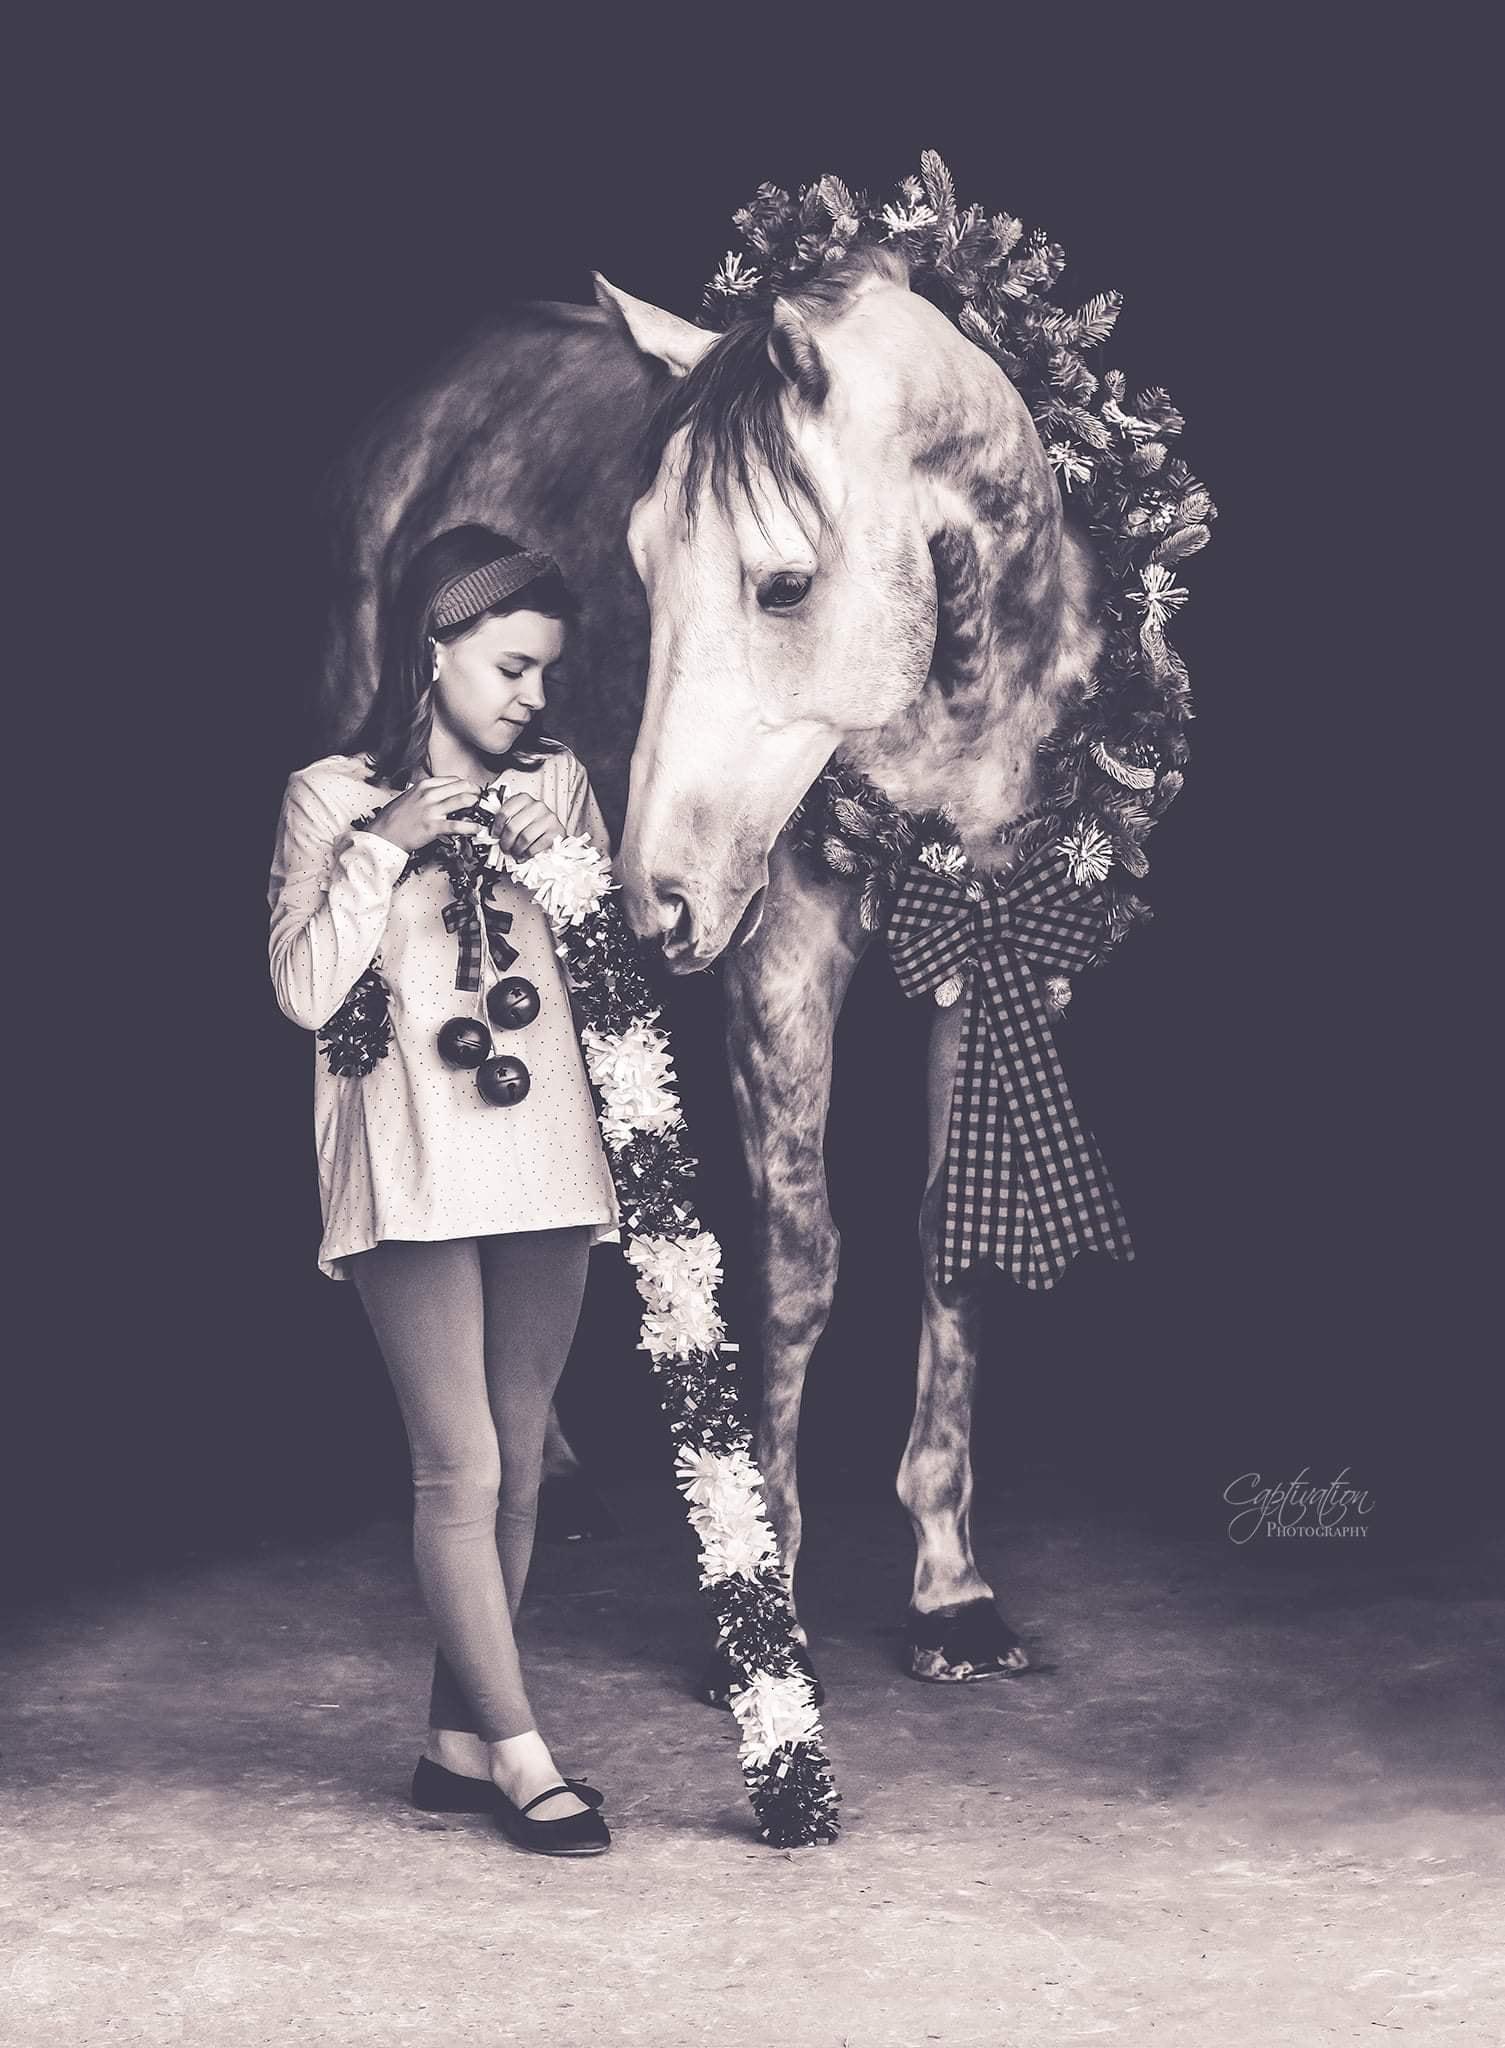 Desafio fotográfico: Boas festas | HORSE NATION 2